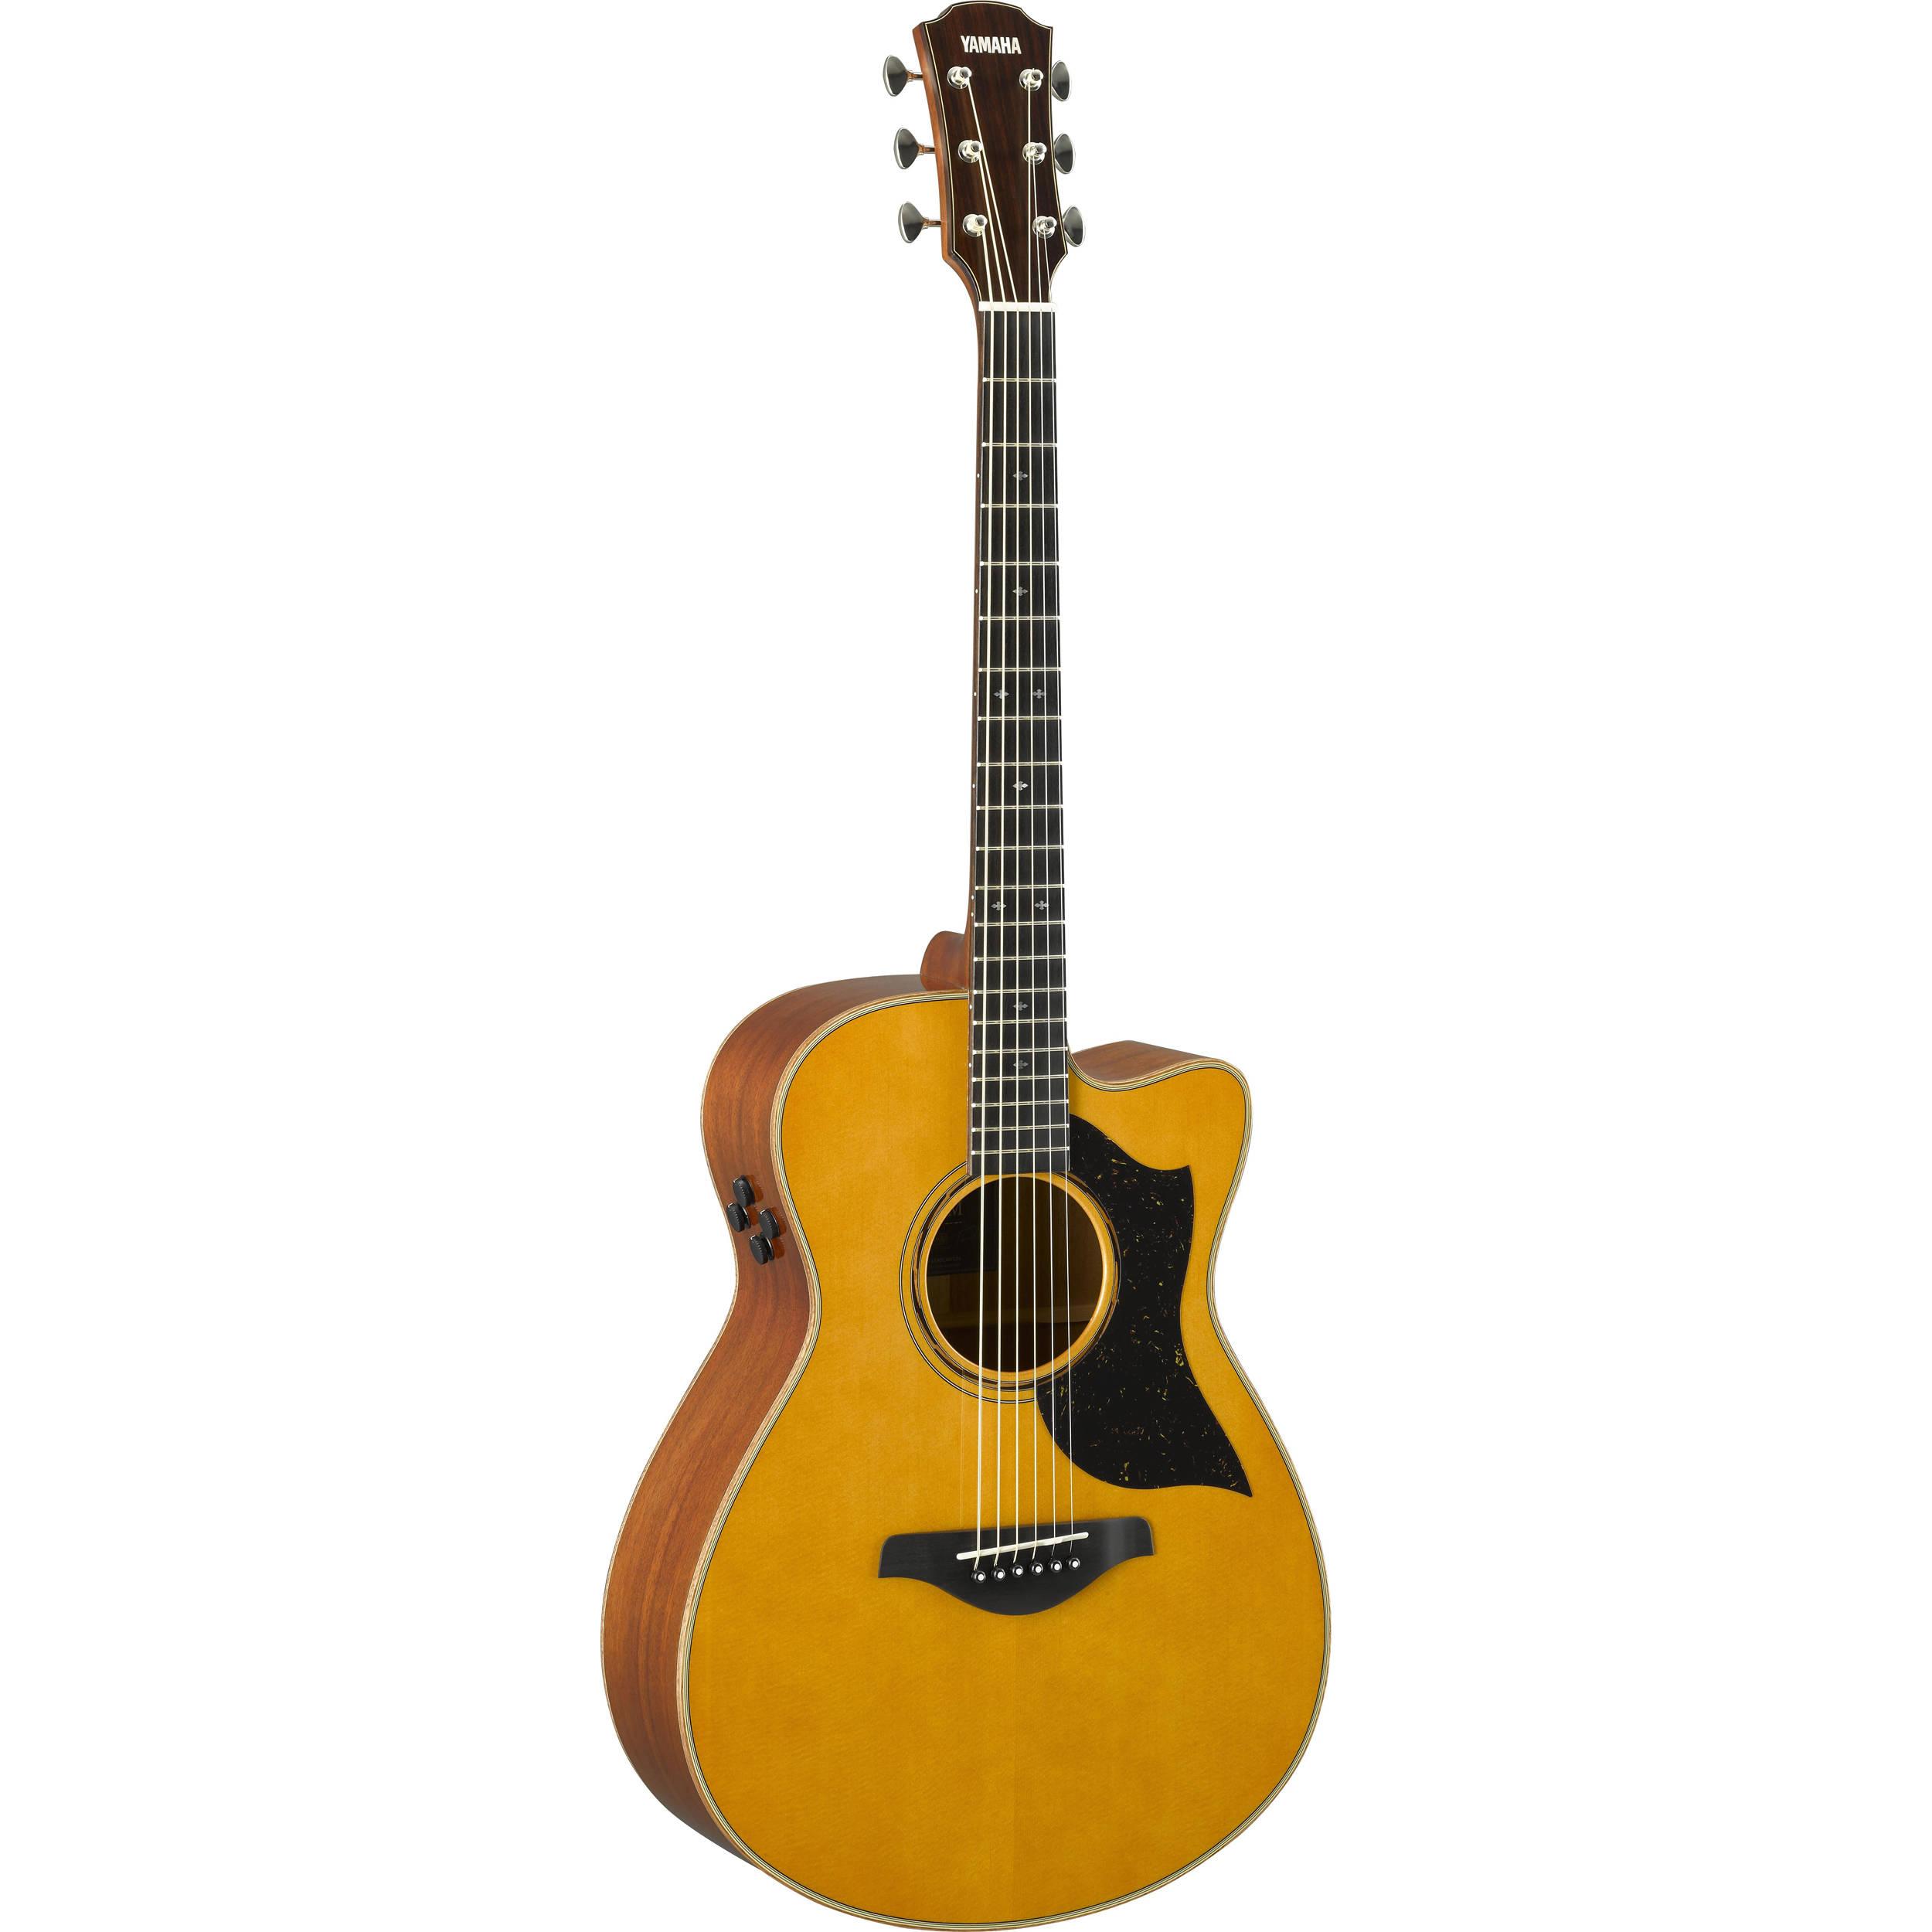 Yamaha ac5m concert cutaway acoustic electric guitar ac5m for Yamaha acoustic electric guitar